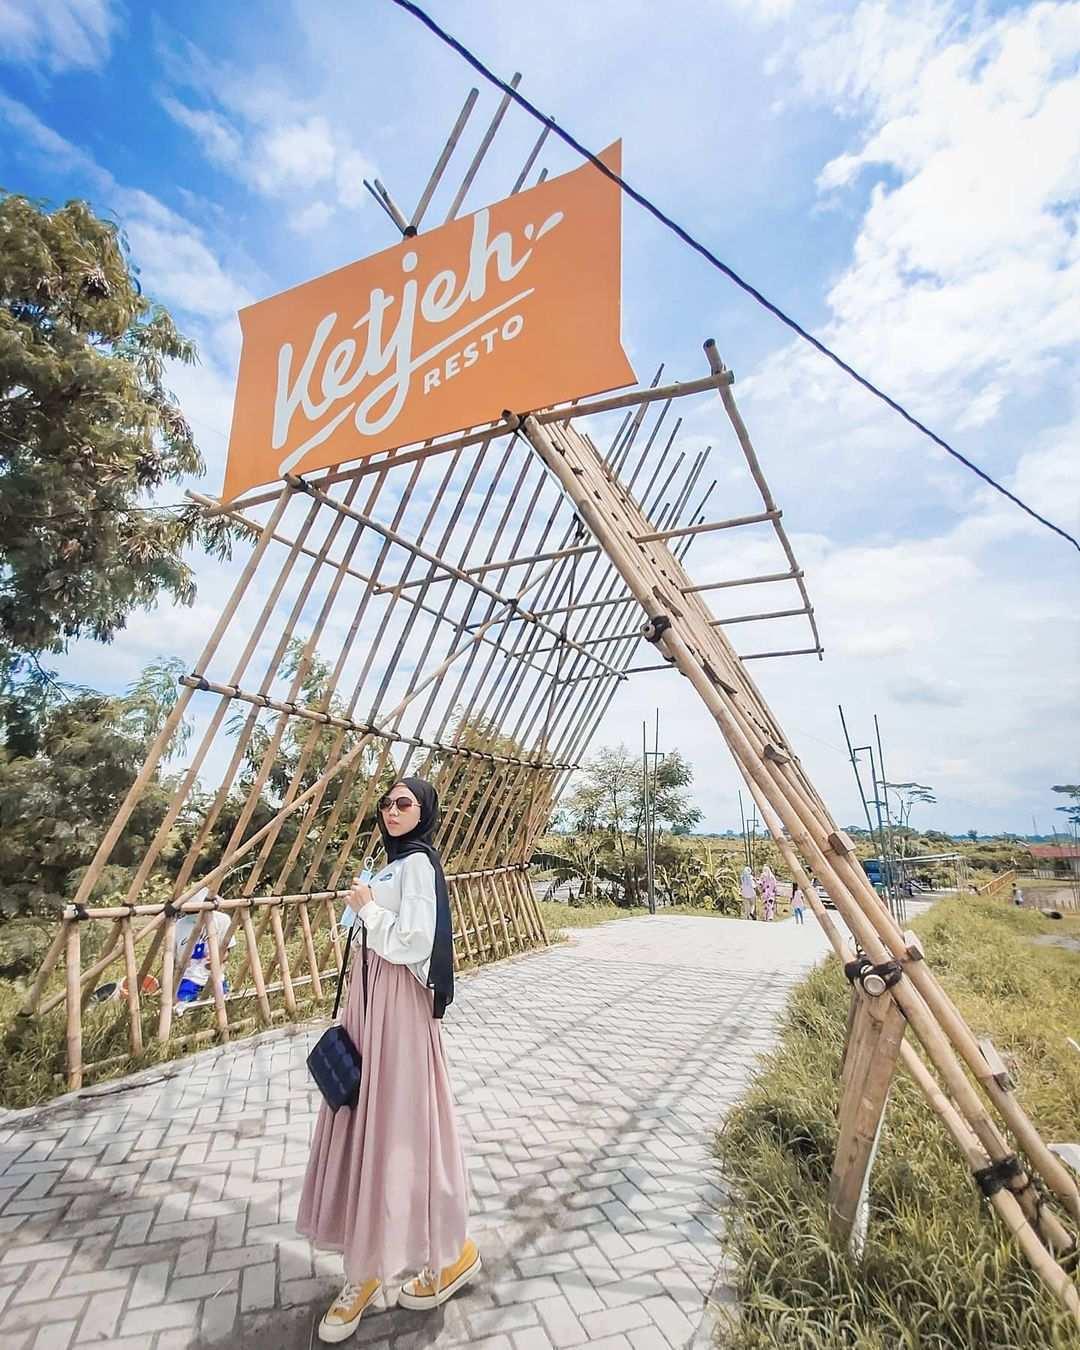 Berfoto di Depan Ketjeh Resto Klaten Image From @its.icha99_